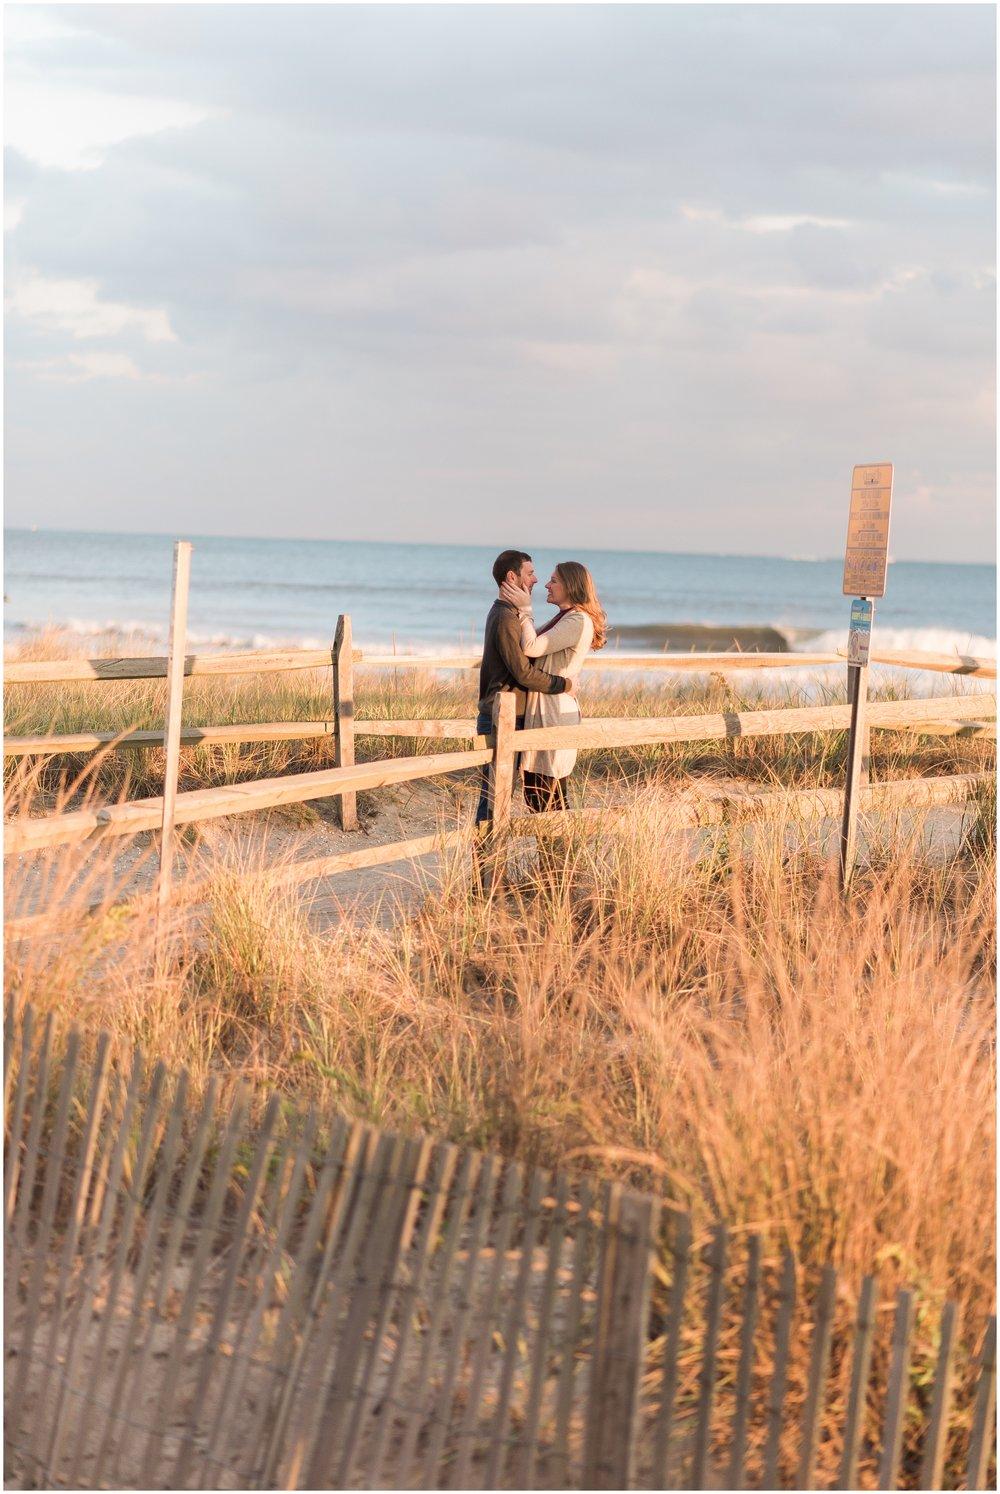 NJ-Ocean-City-Beach-Boardwalk-Engagement-Session-Photo_0078.jpg